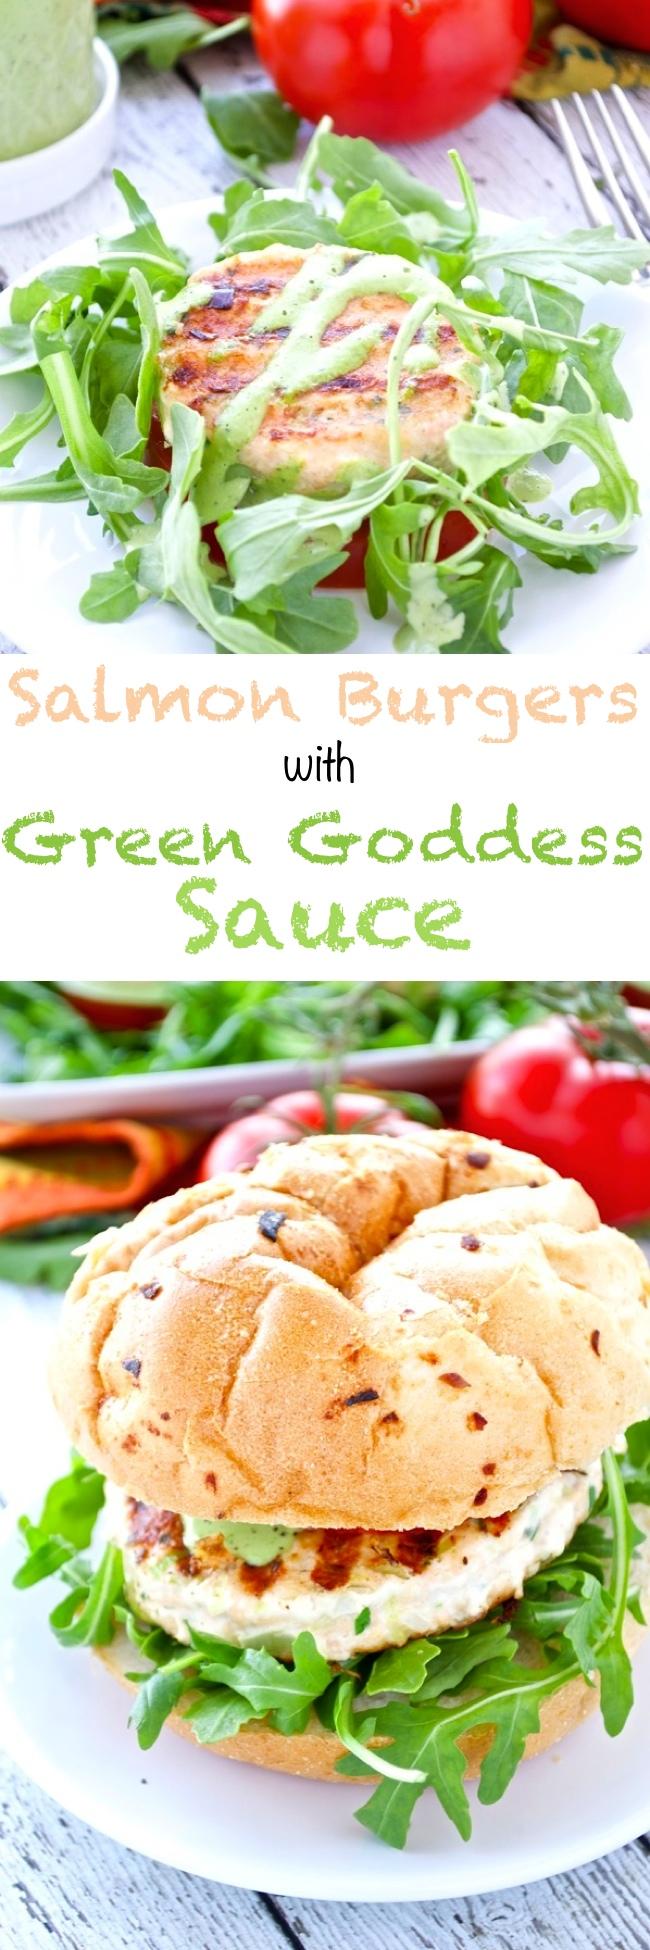 Salmon Burgers with Green Goddess Sauce - Fashionable Foods